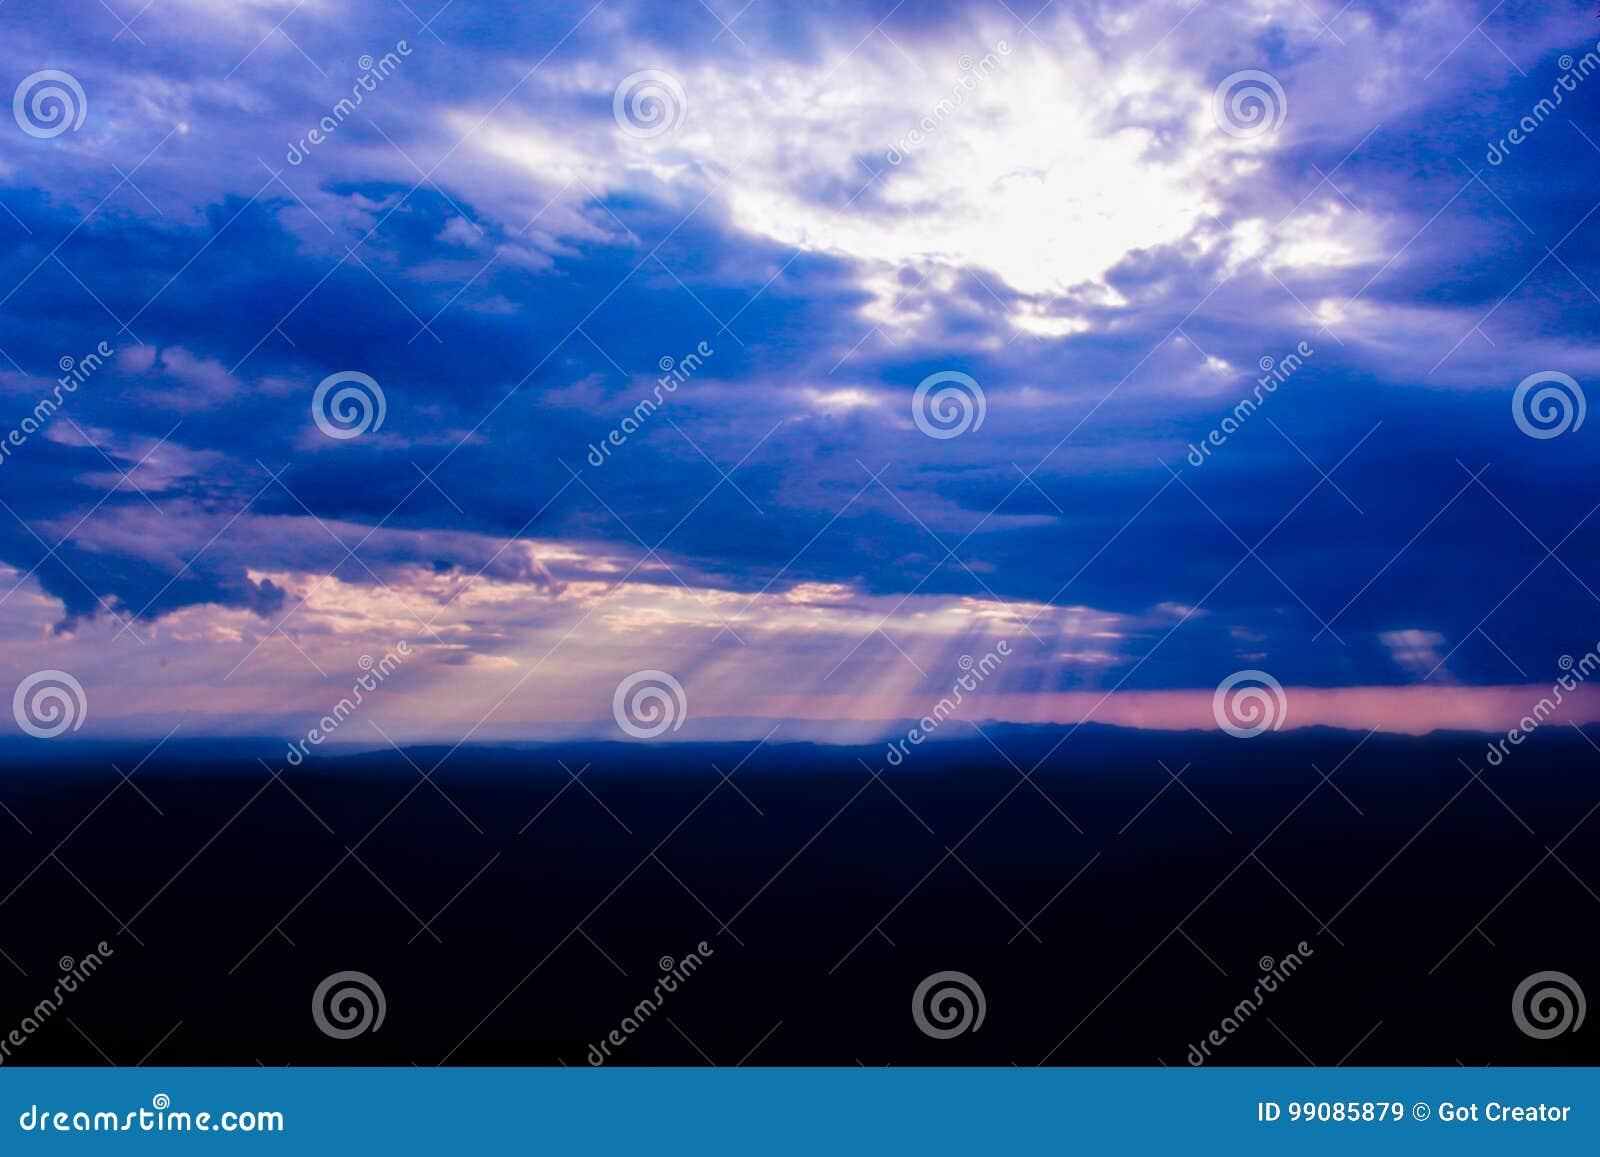 Sunbeam through clouds on blue sky.